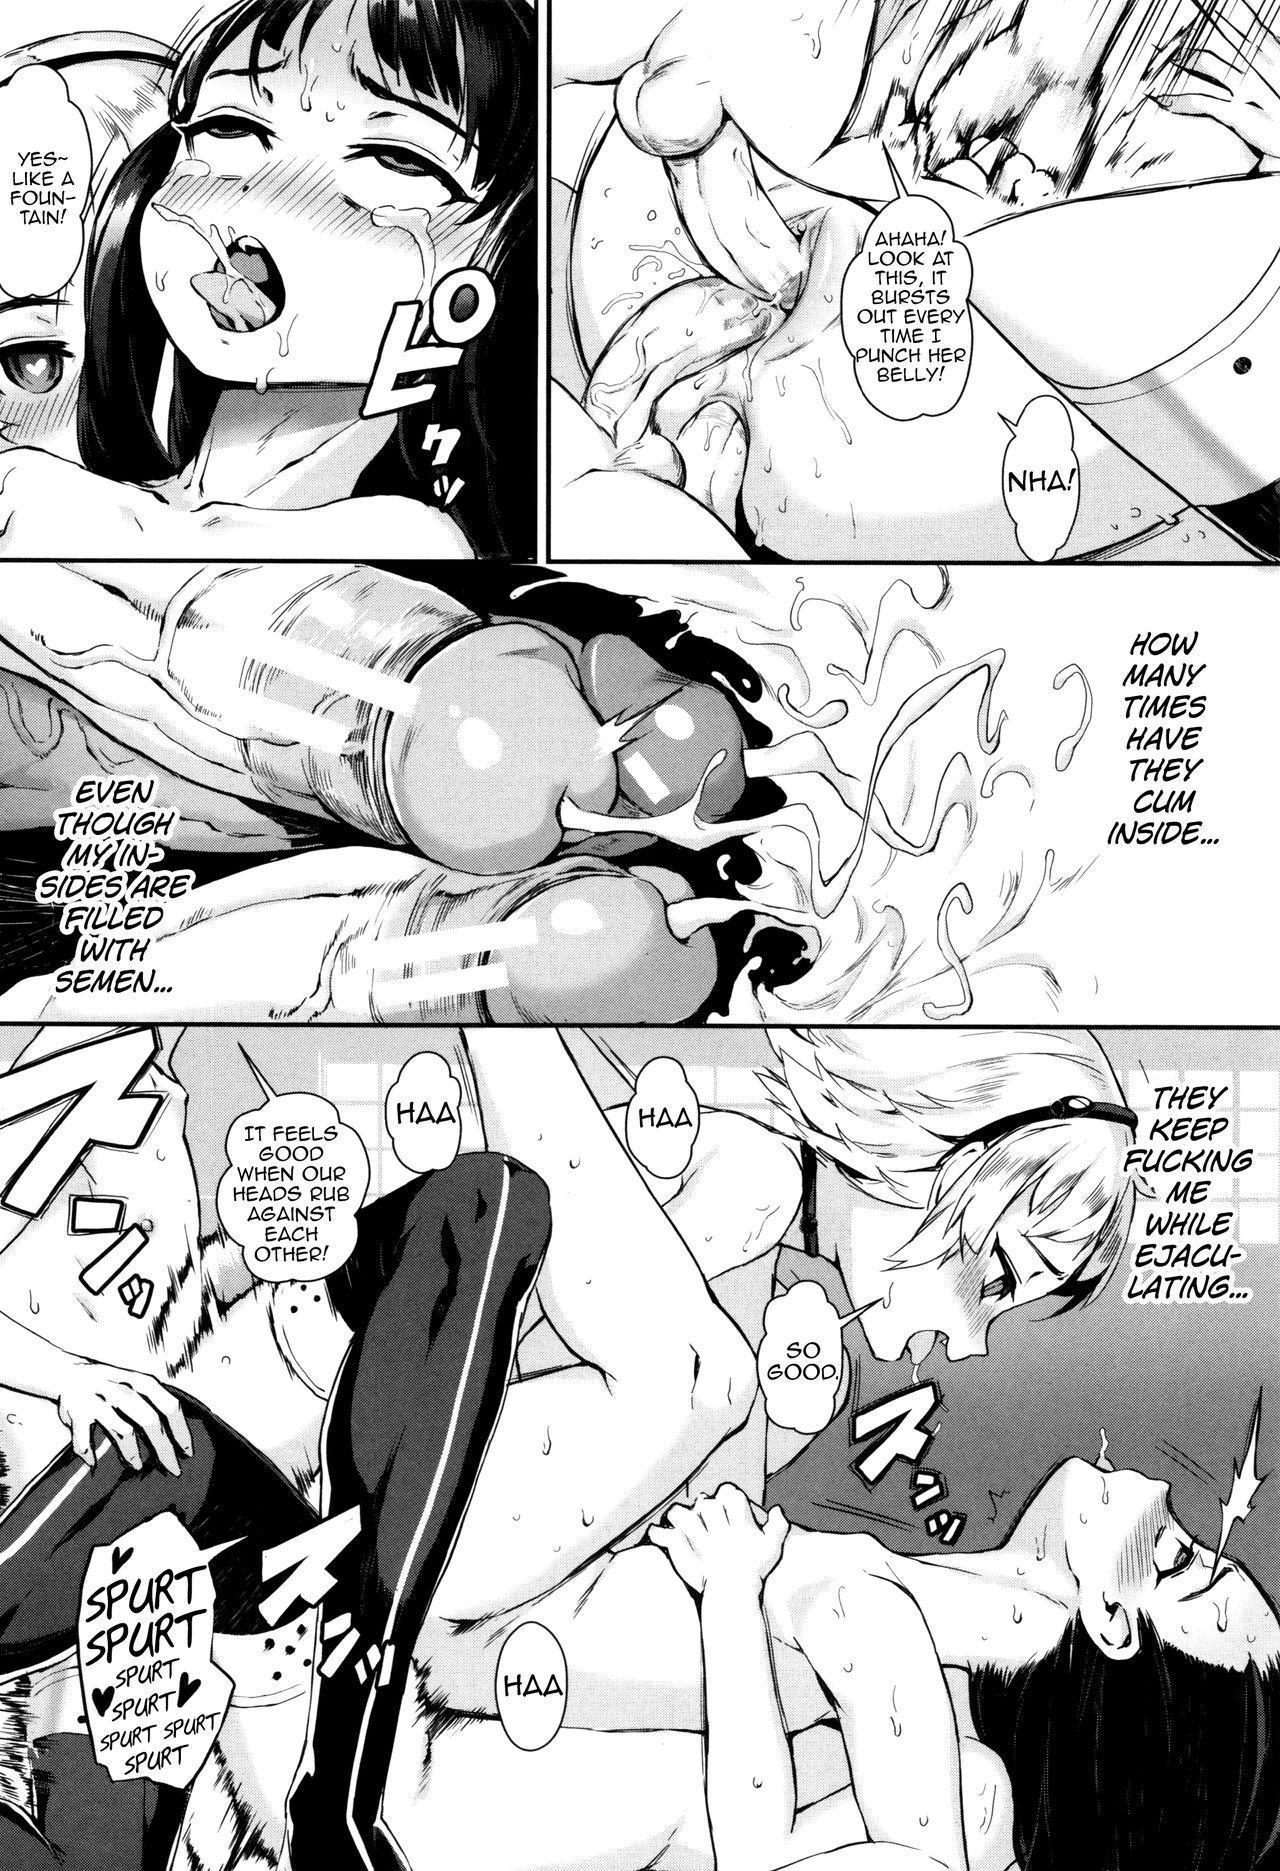 [Jairou] Erotic Training! ~Pakopako Rankou Seikyouiku~ Ch. 1-2 [English] [MrBubbles] 113